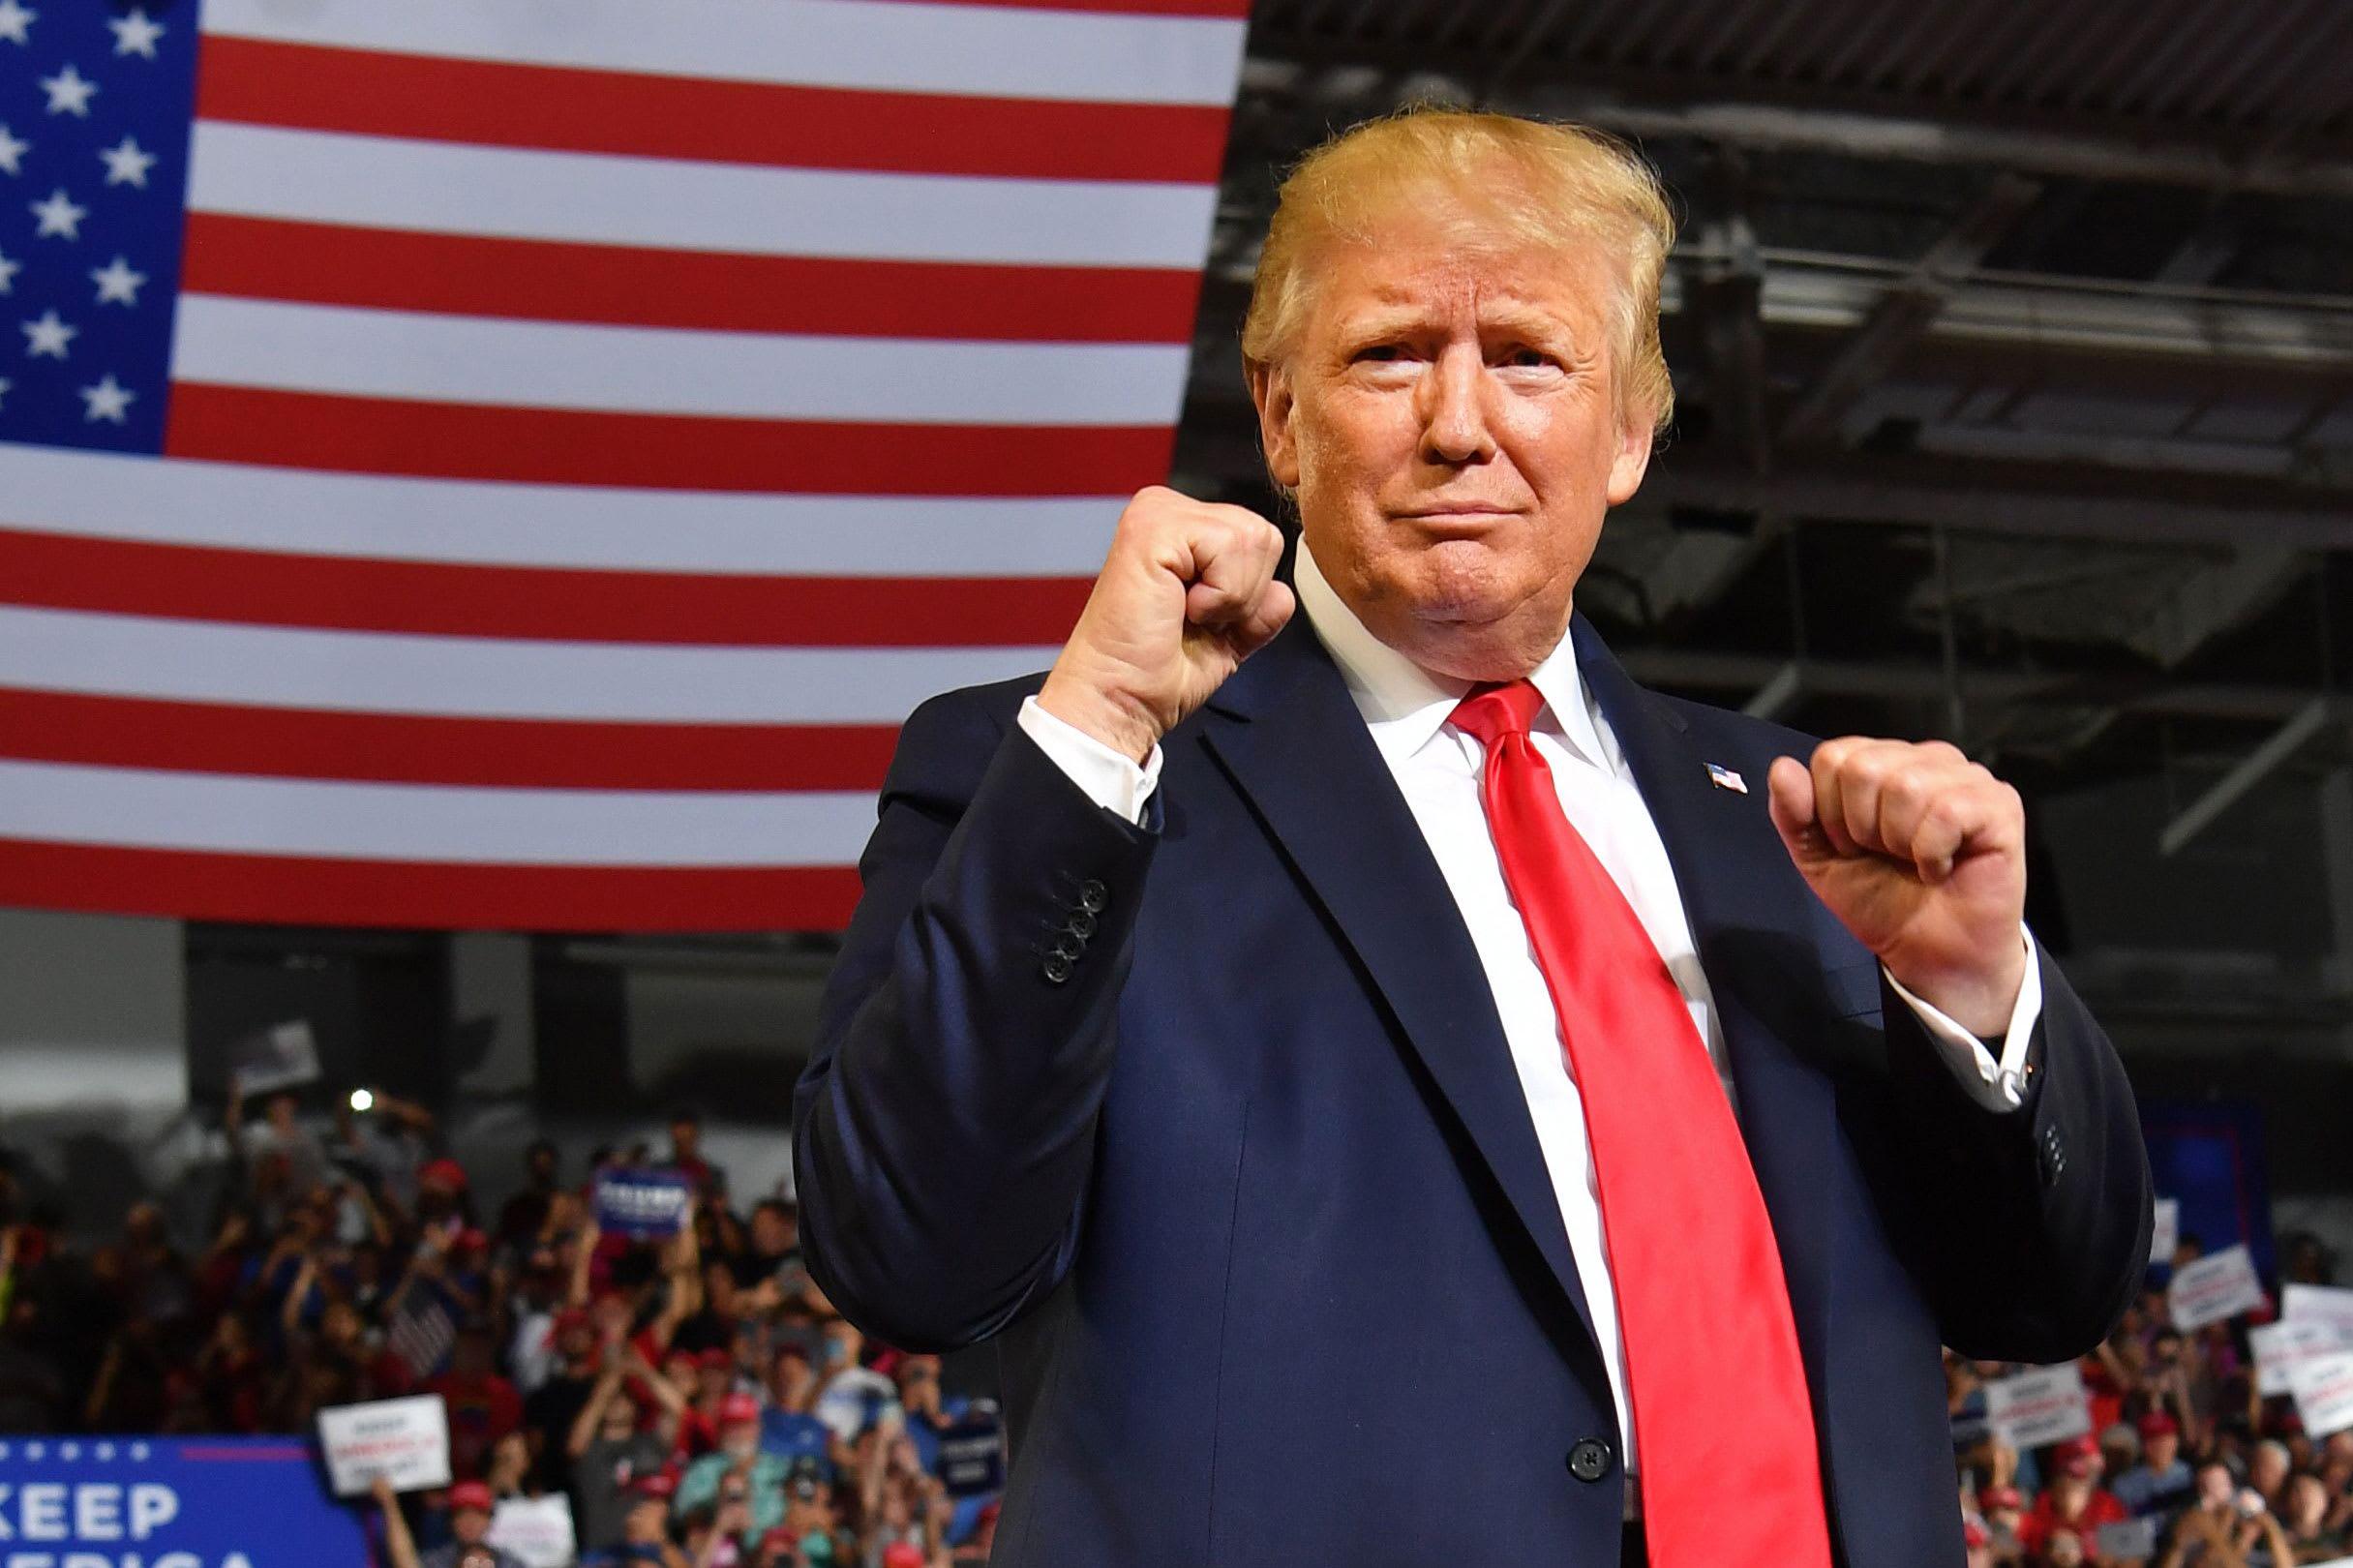 Trump gains in Ohio, Biden ahead in Michigan, Pennsylvania, Wisconsin